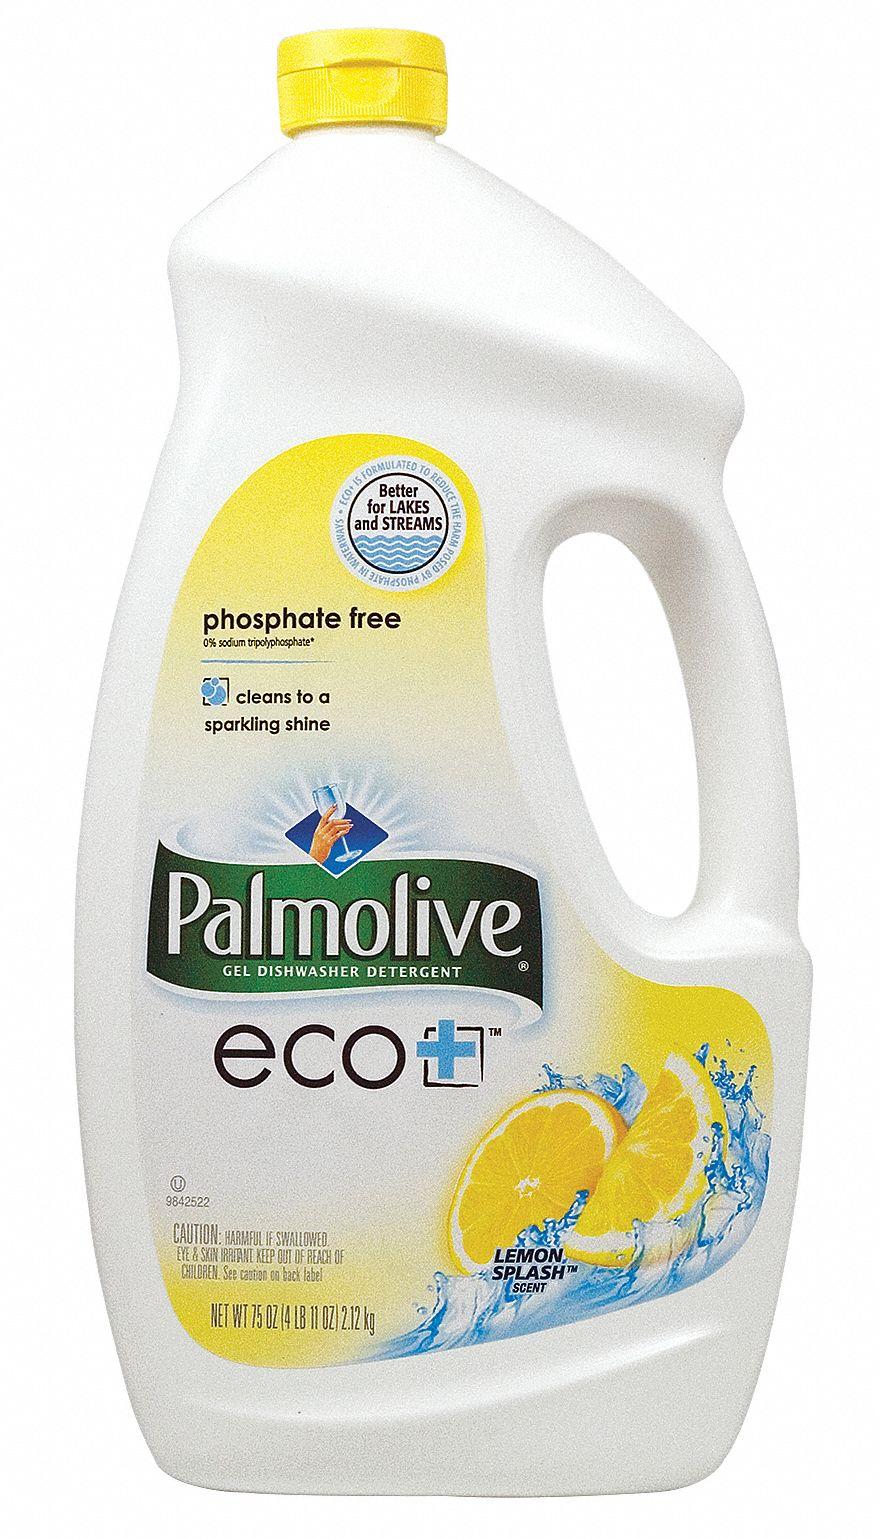 PALMOLIVE Liquid Atmtc Dishwashing DtrgtLemonPK6 22C526CPC